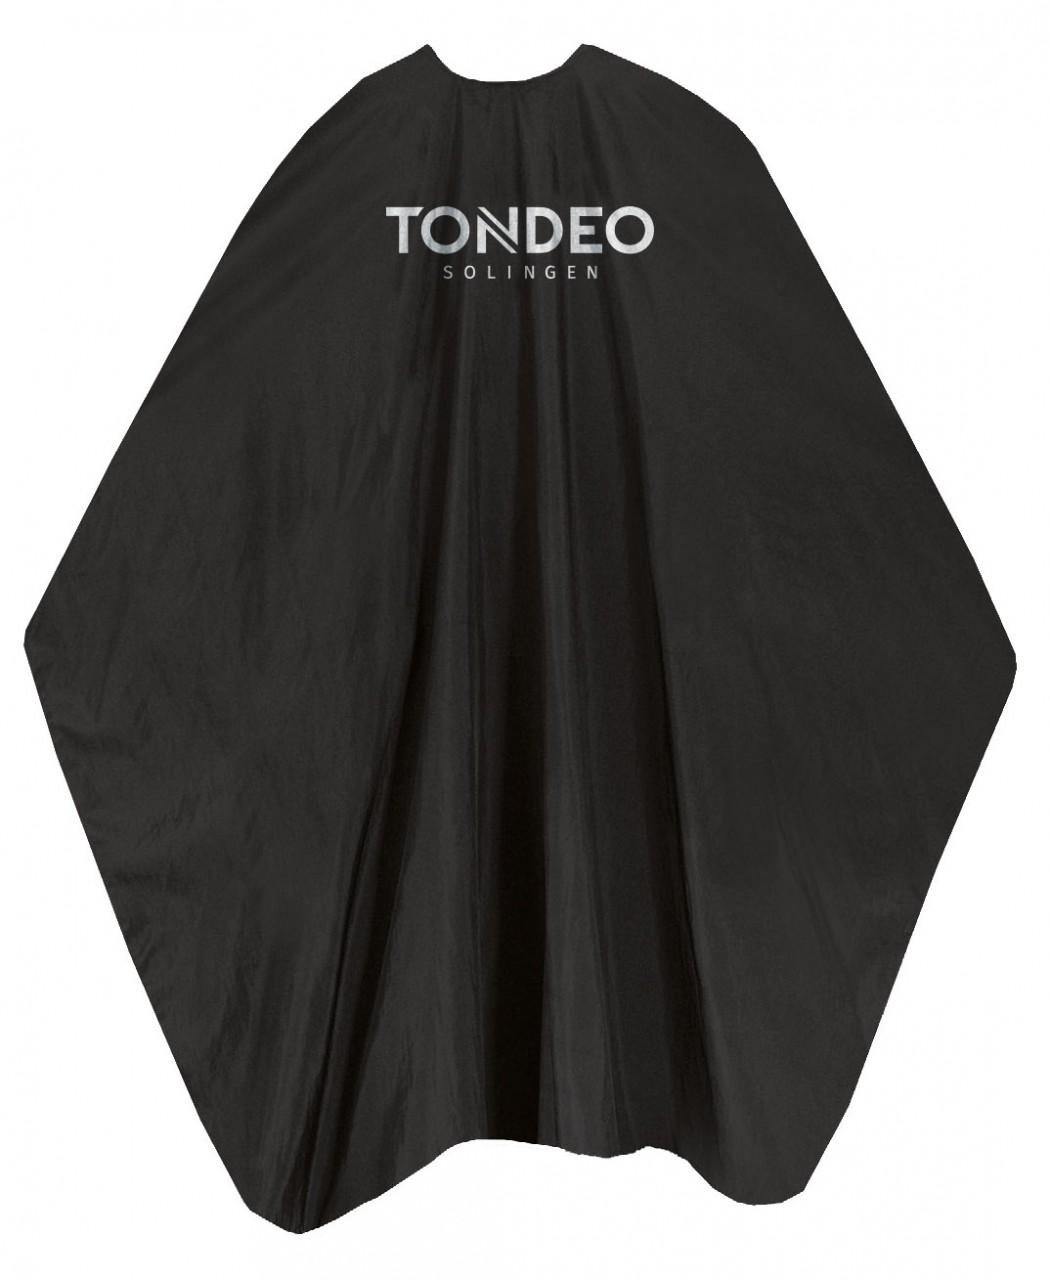 Hairdresser Cape TONDEO CUT